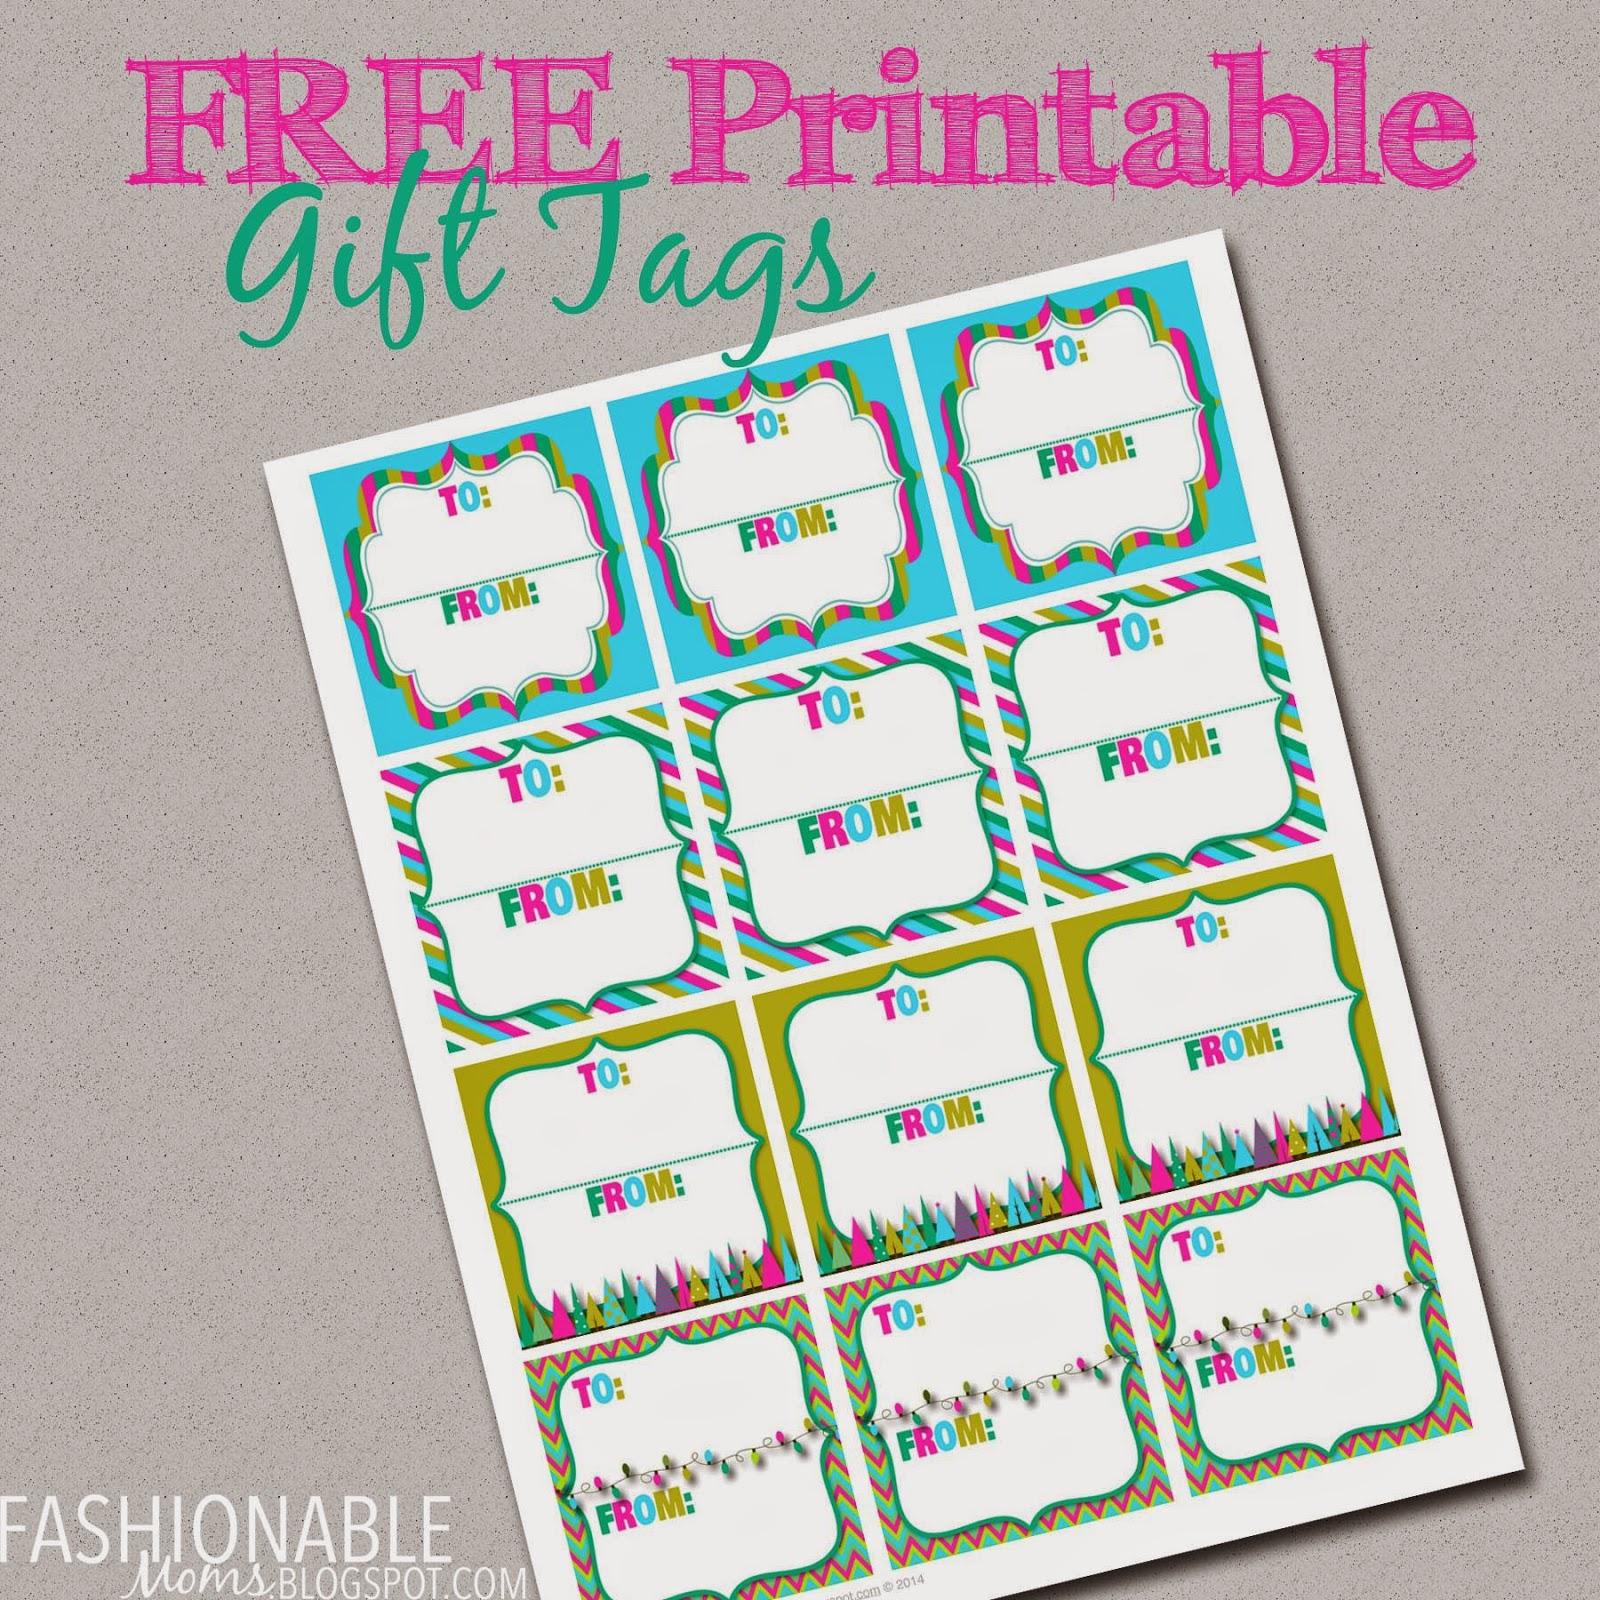 My Fashionable Designs Free Printable Gift Tags